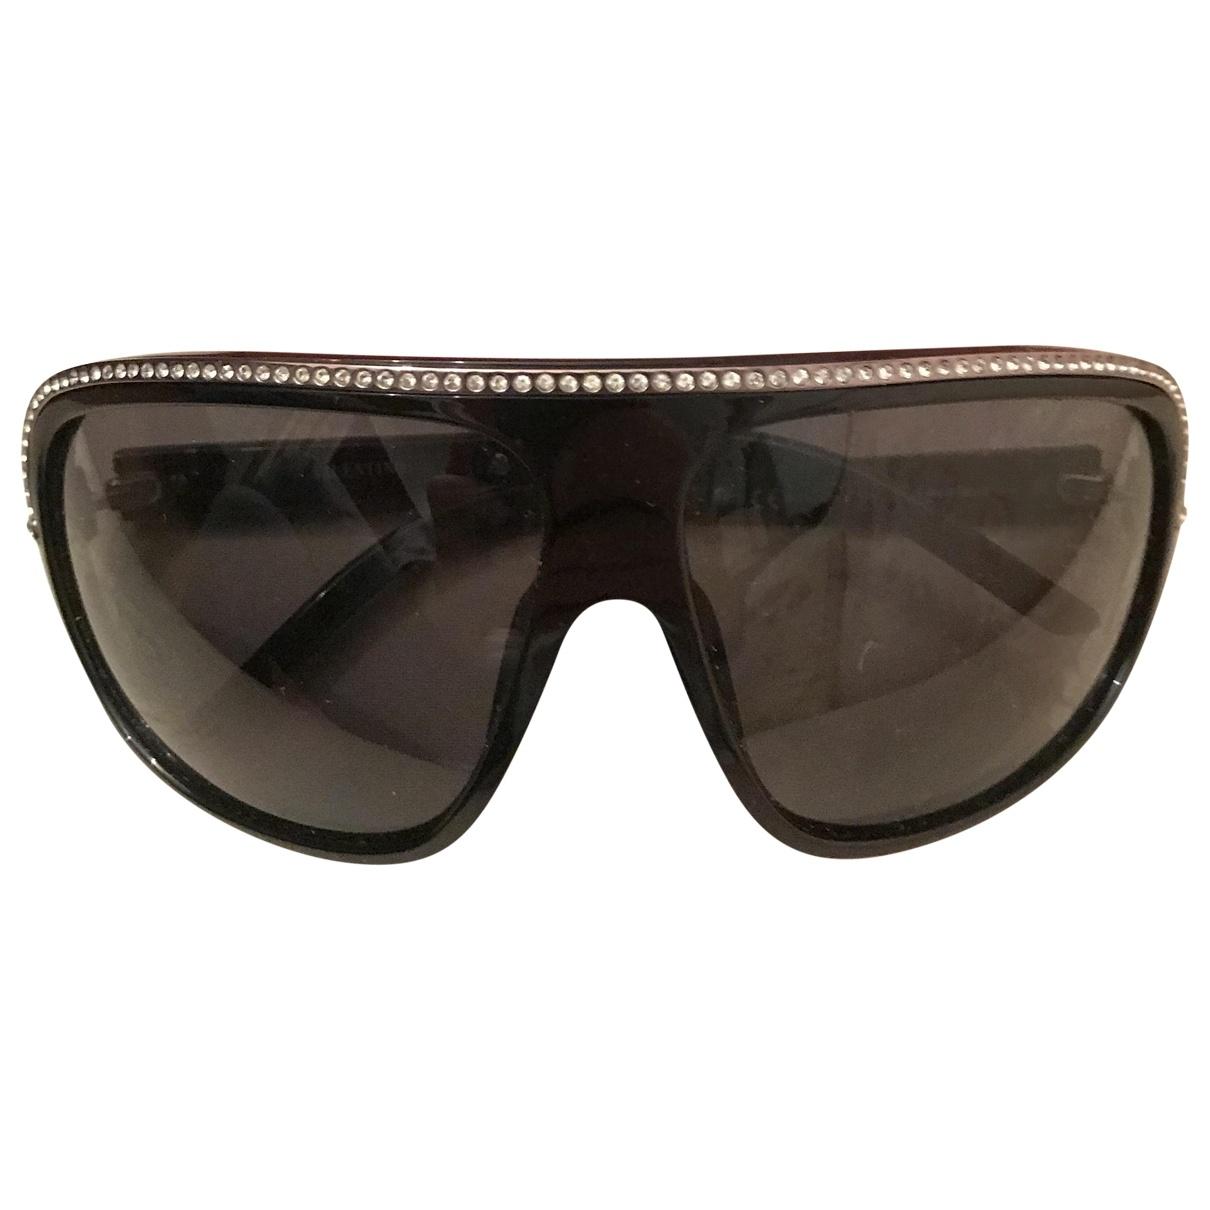 Gafas mascara Valentino Garavani